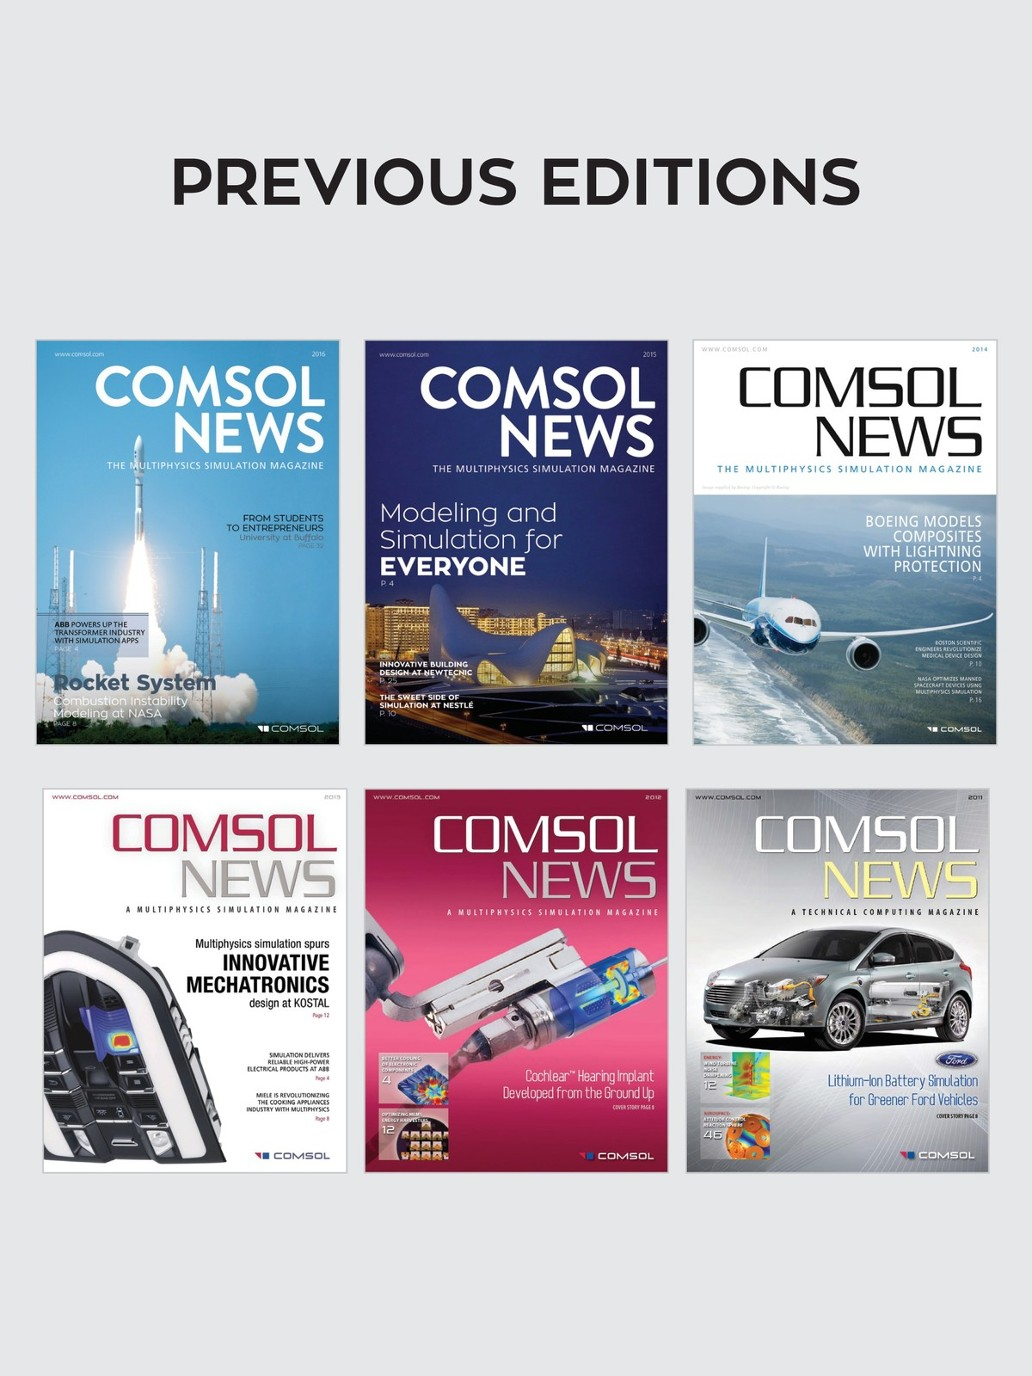 COMSOL News 2017: A Multiphysics Simulation Magazine